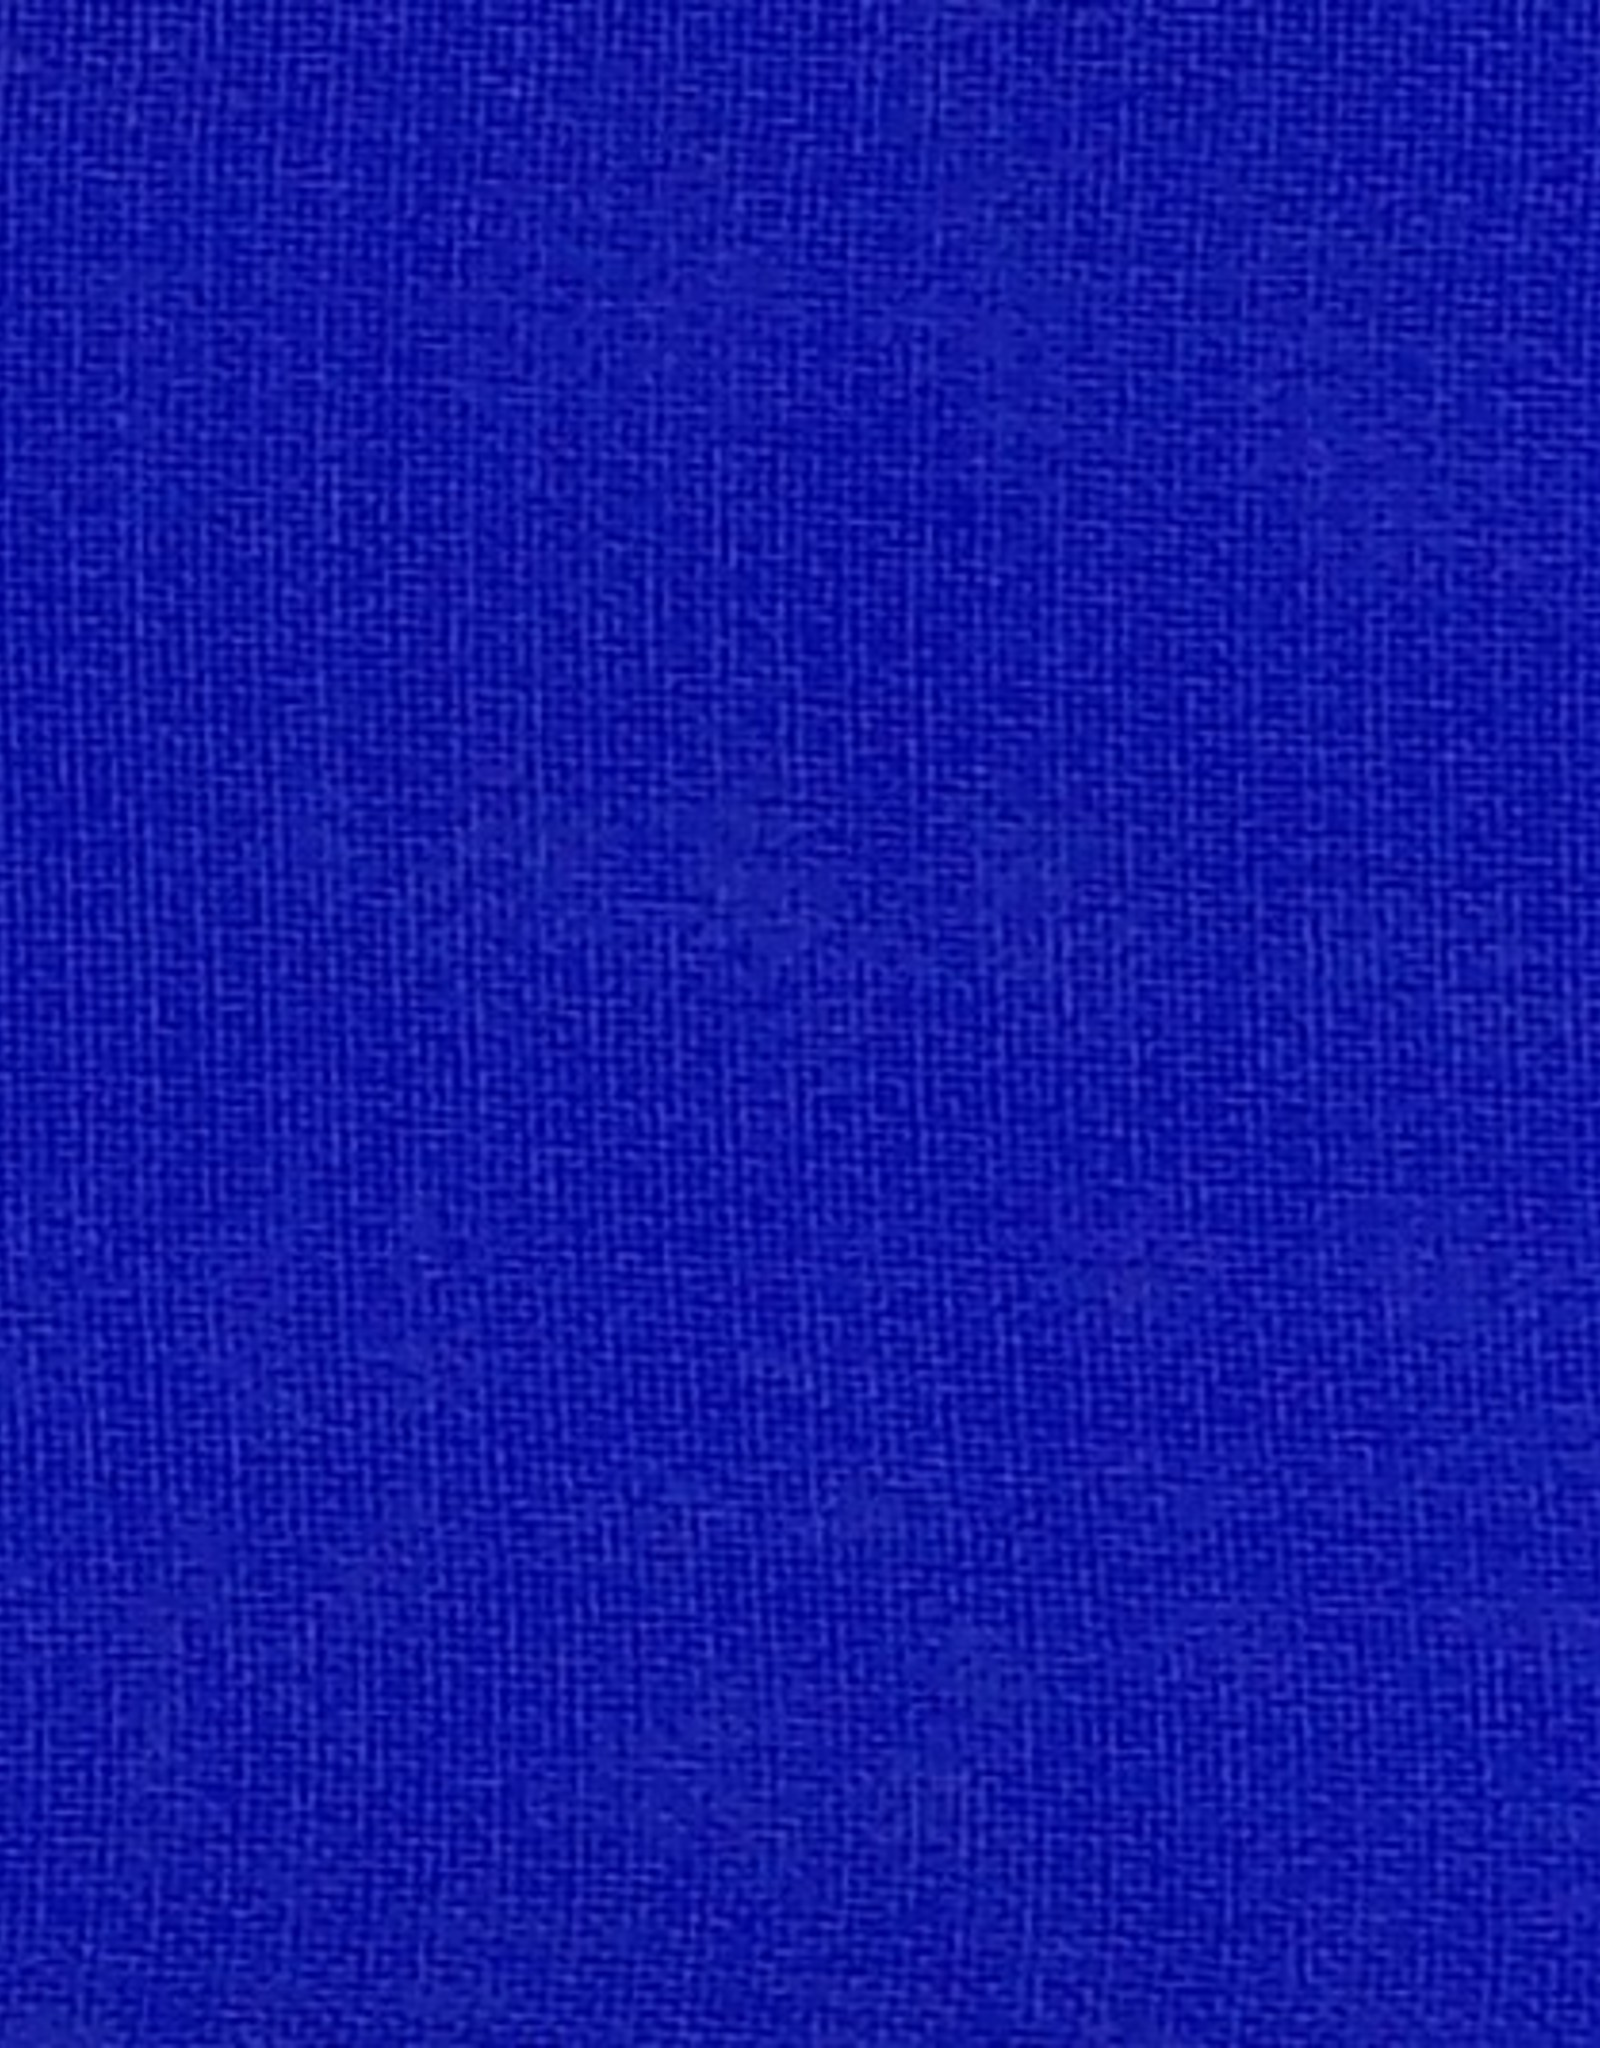 Chiffon 58 - 60 Inches Royal Blue (Yard)